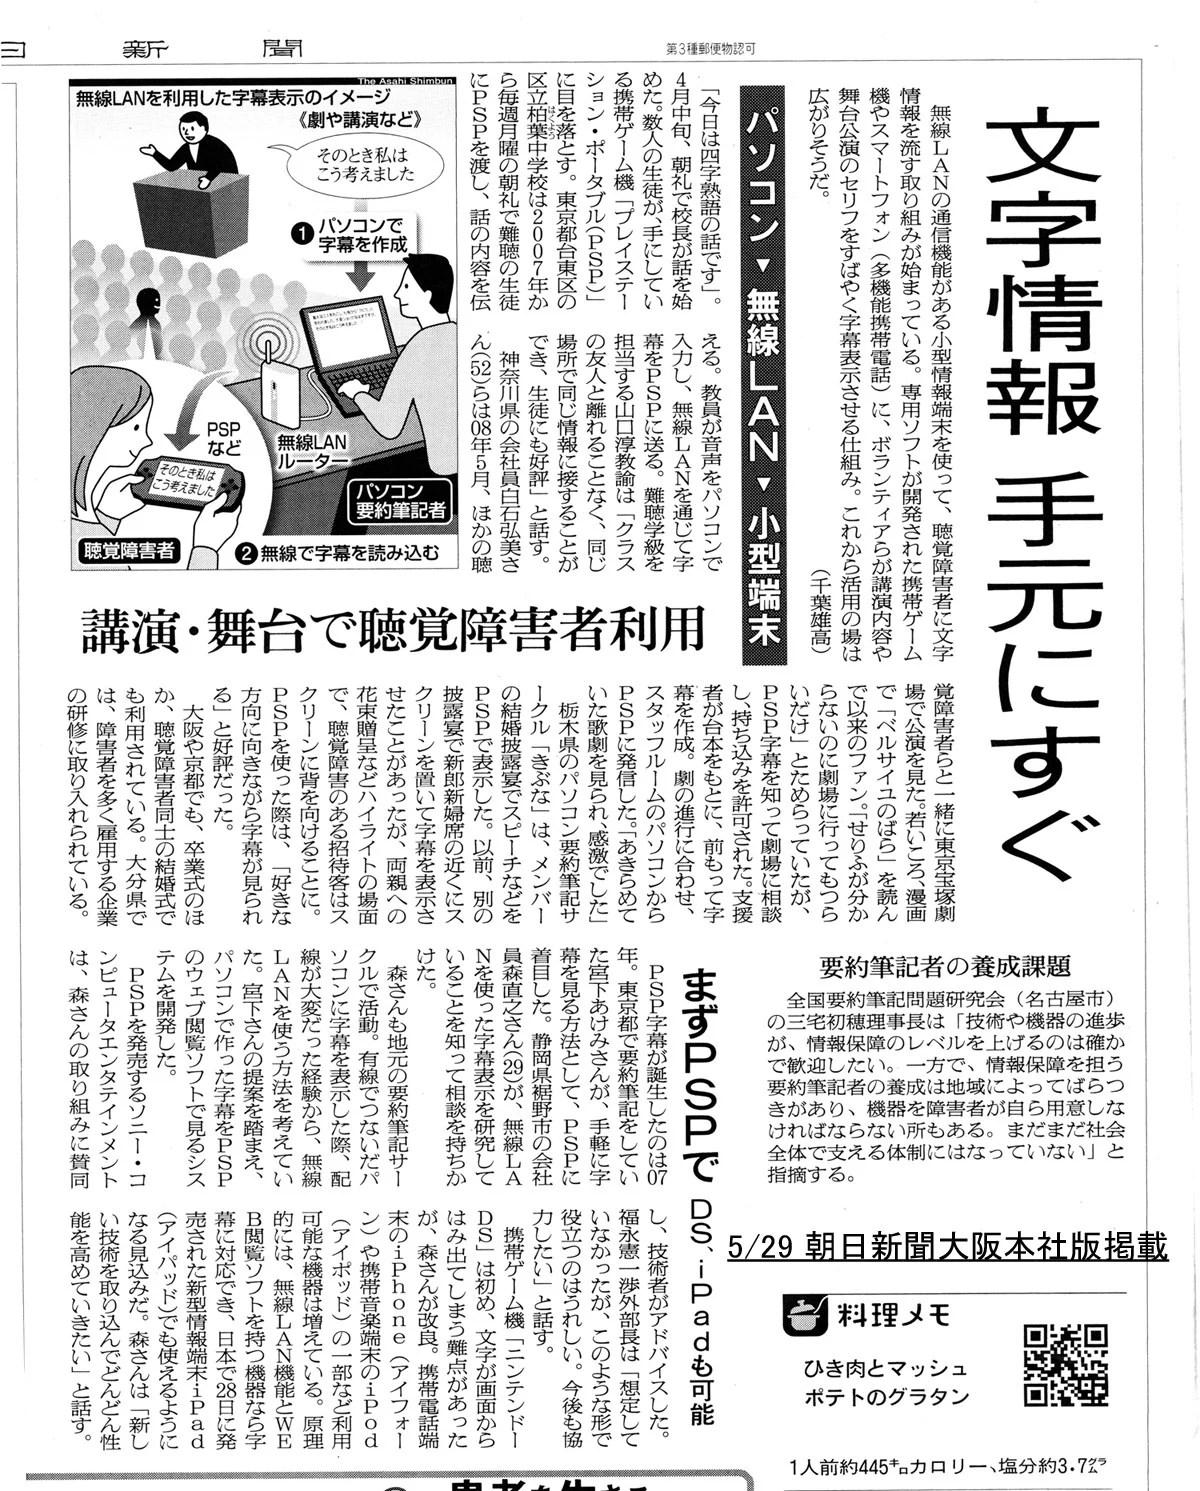 PSPへの文字表示など(朝日新聞大阪版) : おばば奇譚